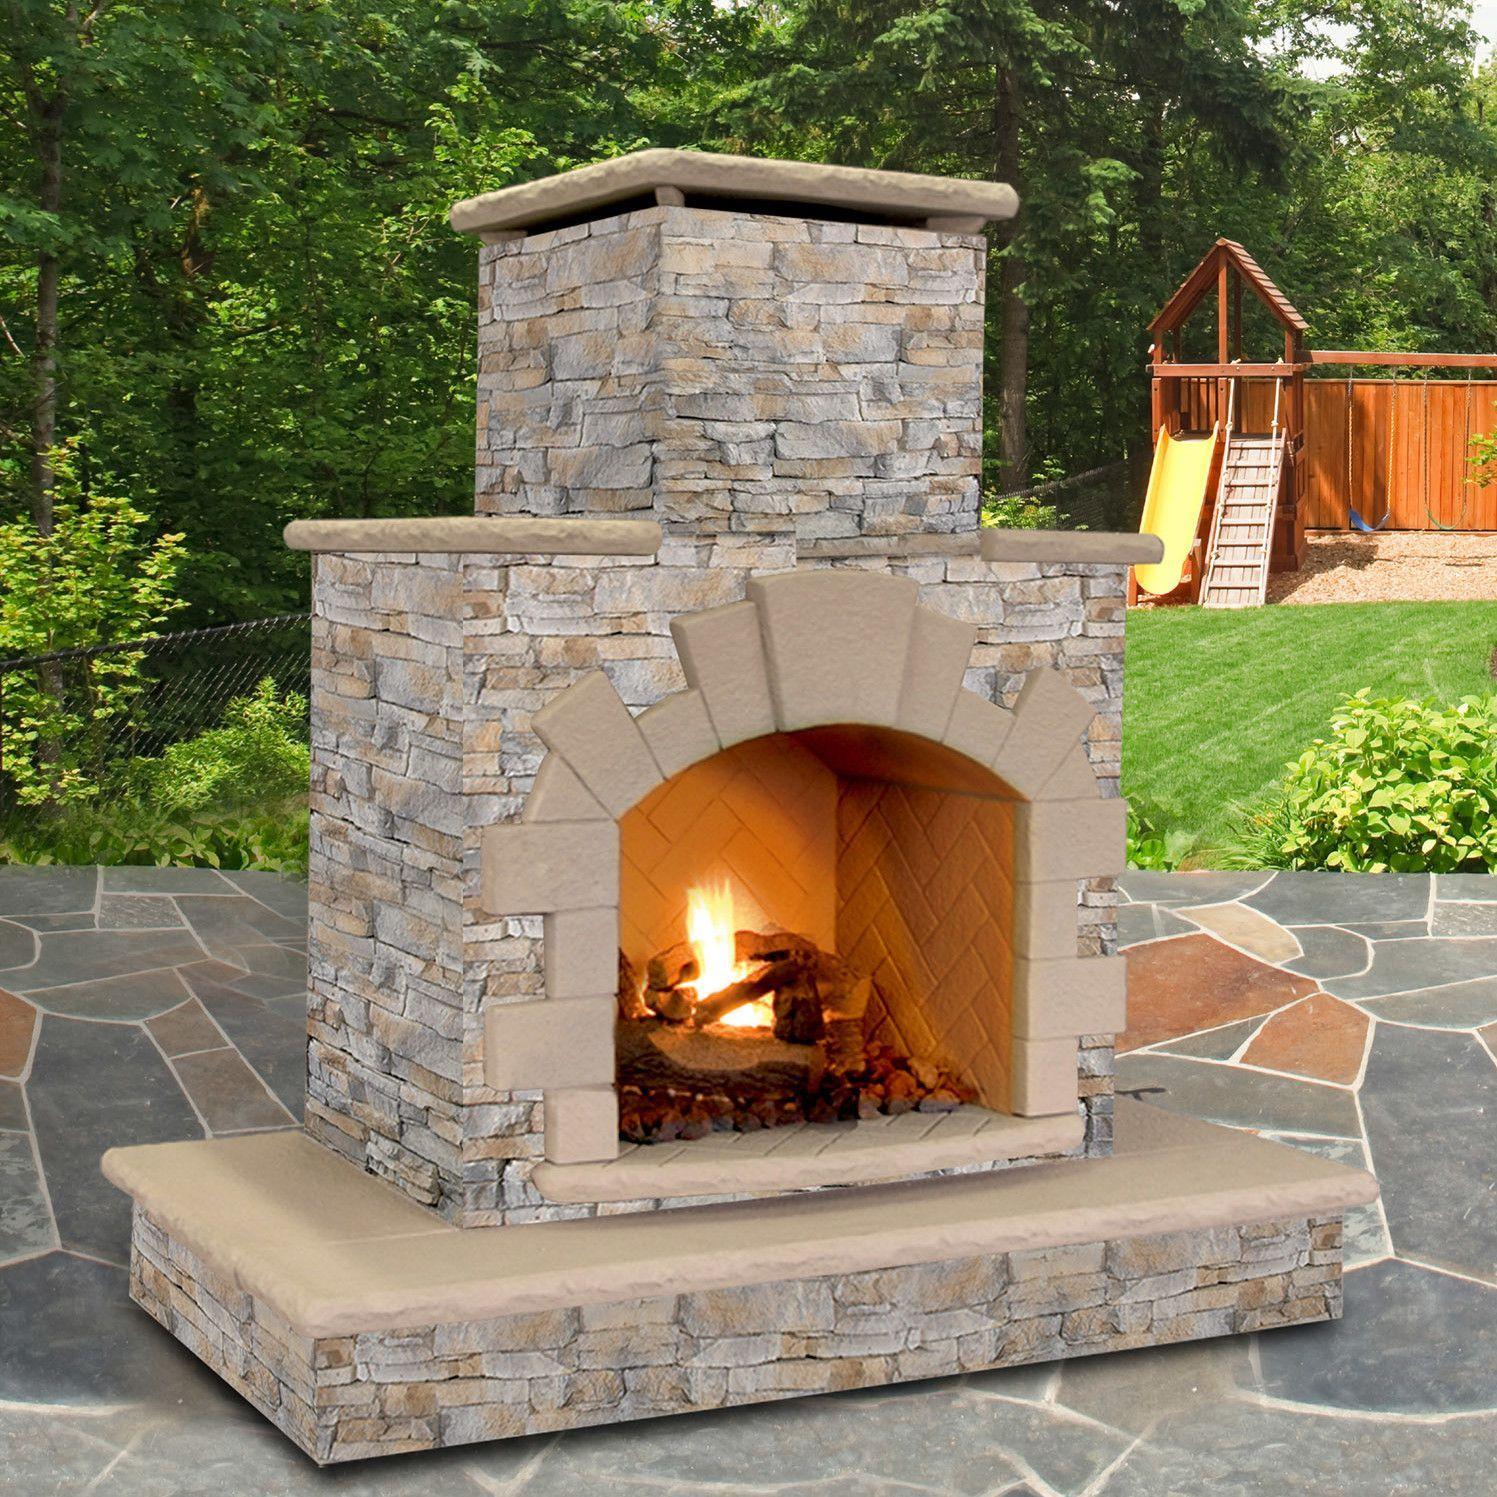 Stone Veneer Propane Natural Gas Outdoor Fireplace Natural Gas Outdoor Fireplace Outdoor Fireplace Outdoor Fireplace Designs